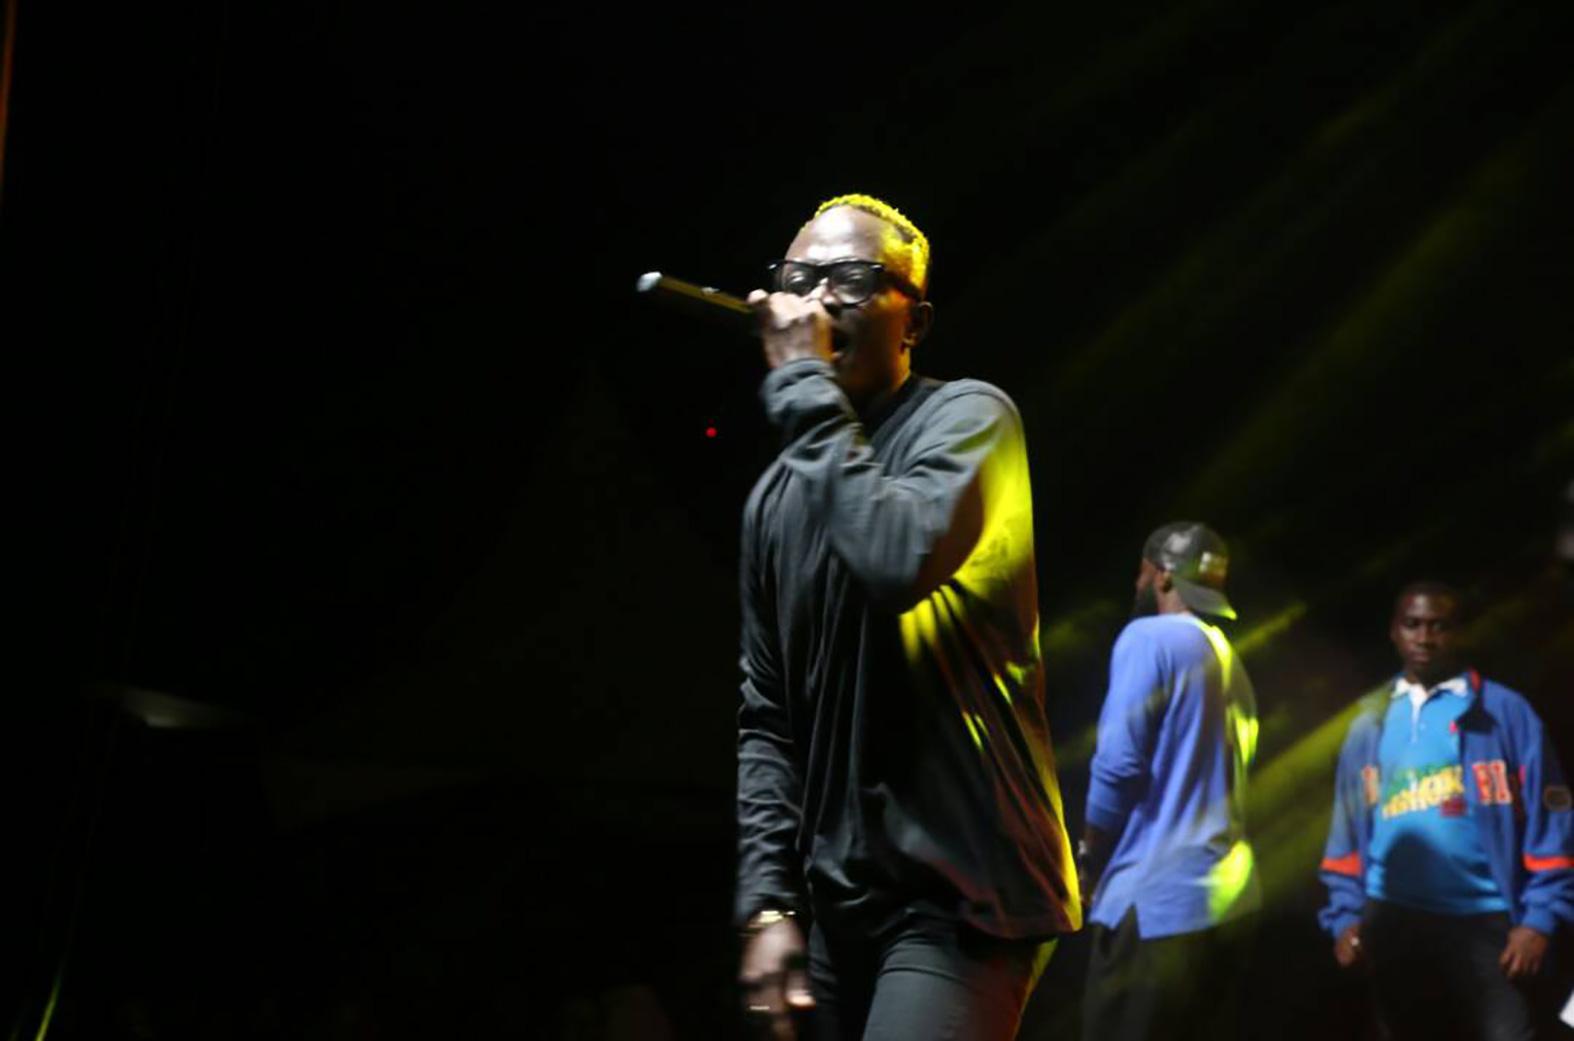 Eboo performing